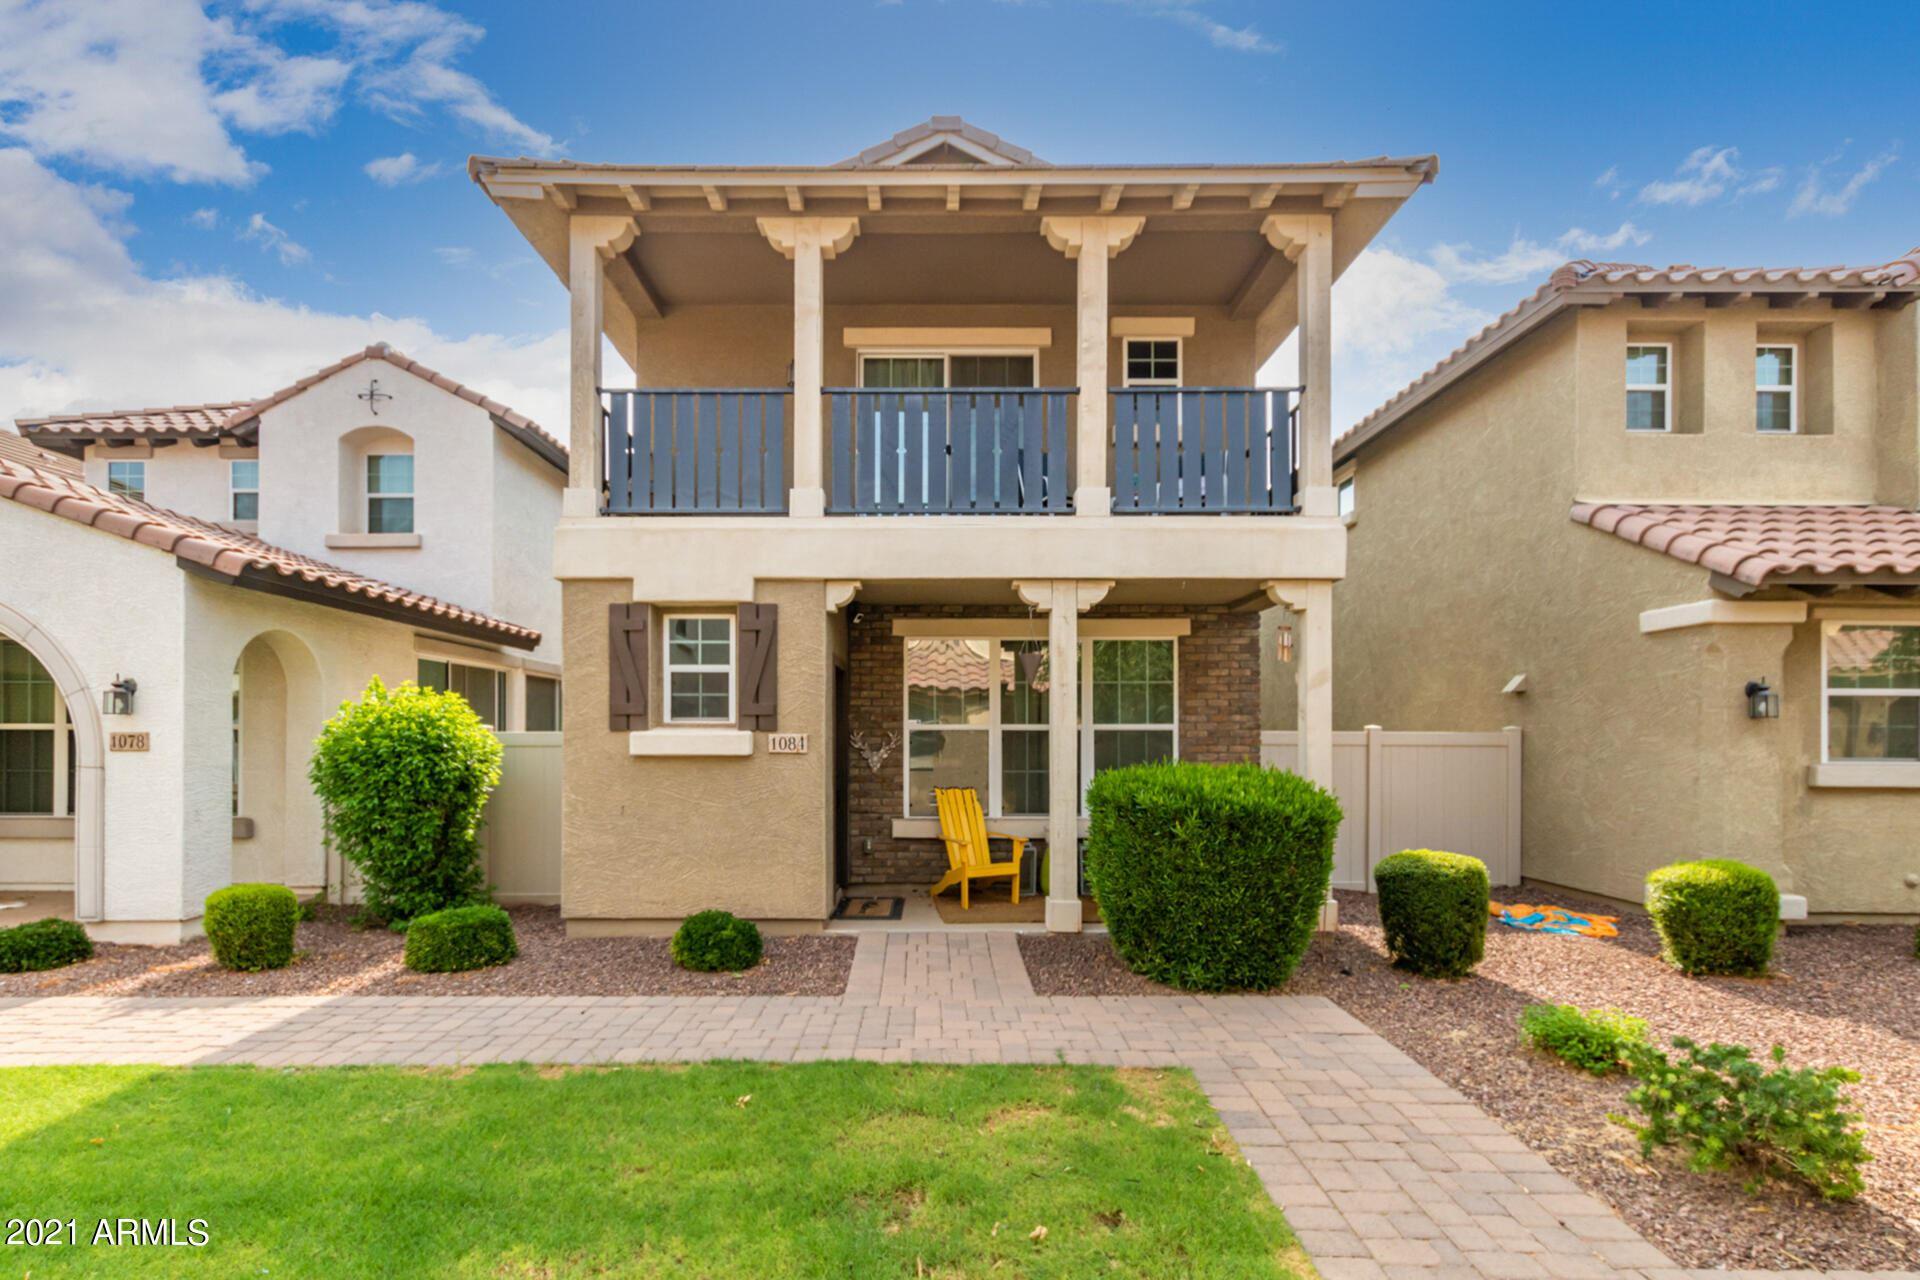 Photo of 1084 S AGNES Lane, Gilbert, AZ 85296 (MLS # 6269389)